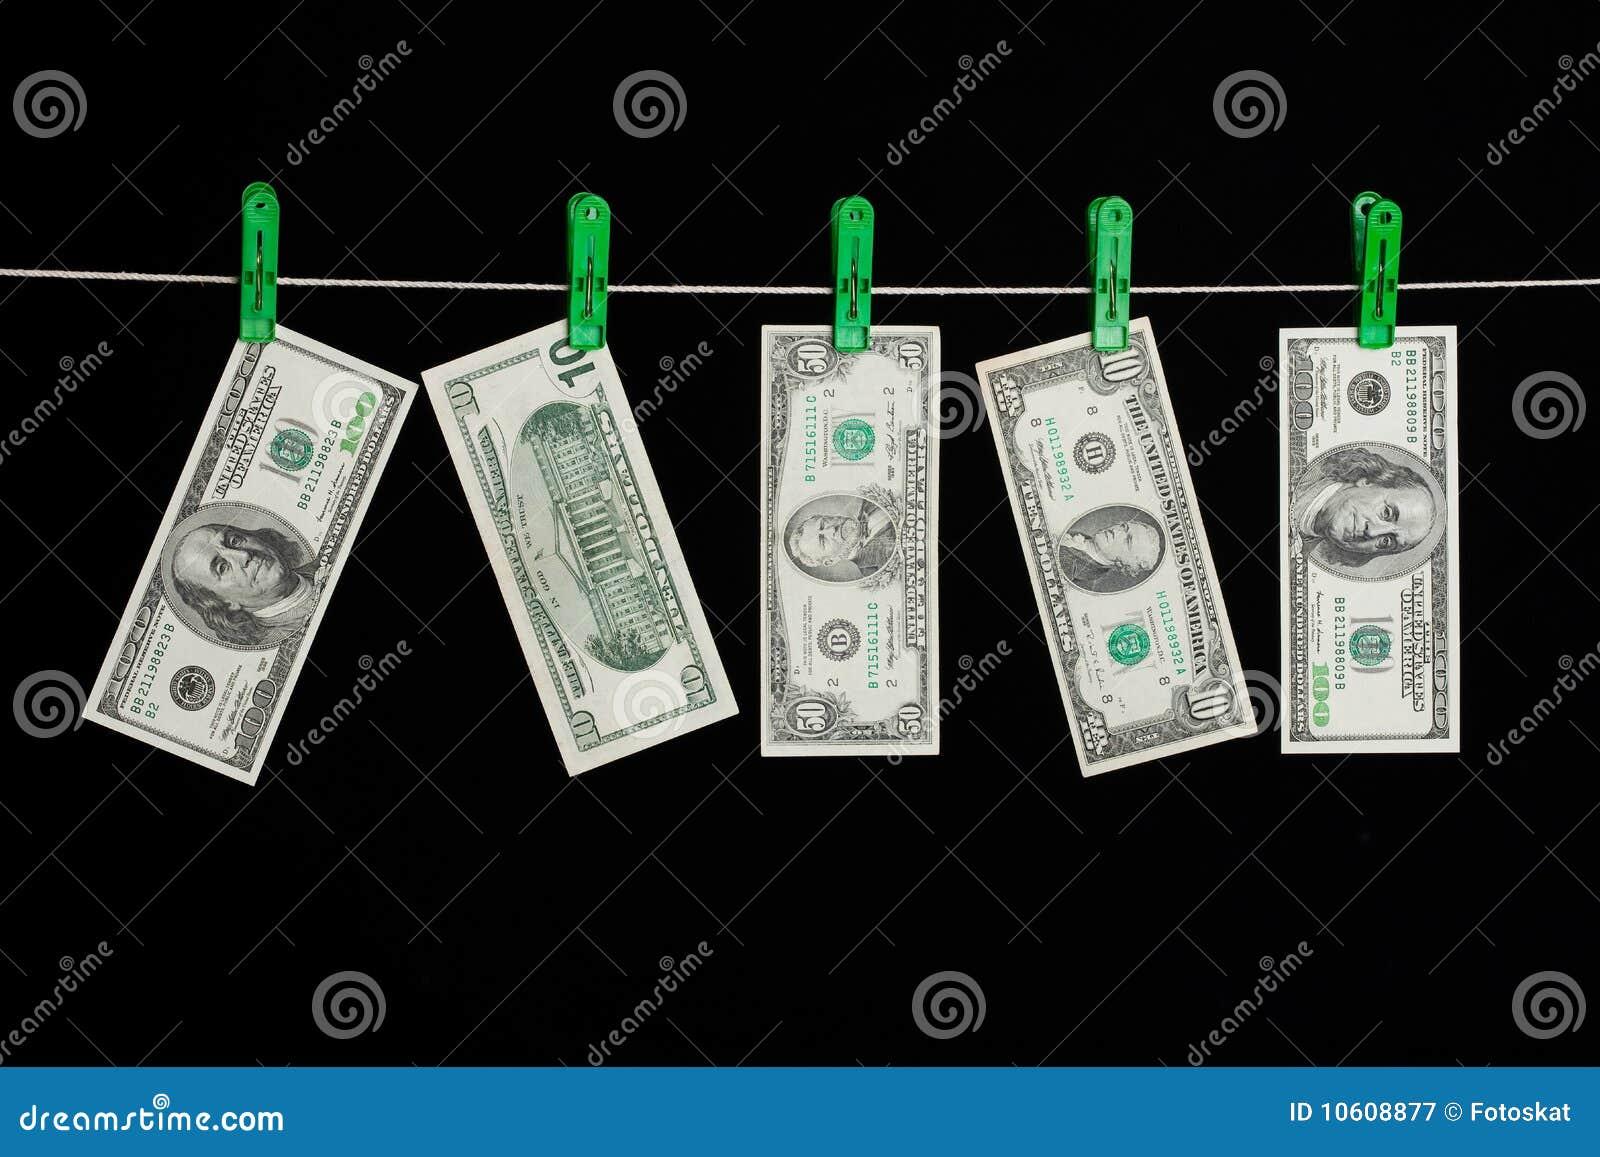 How to launder money escorts